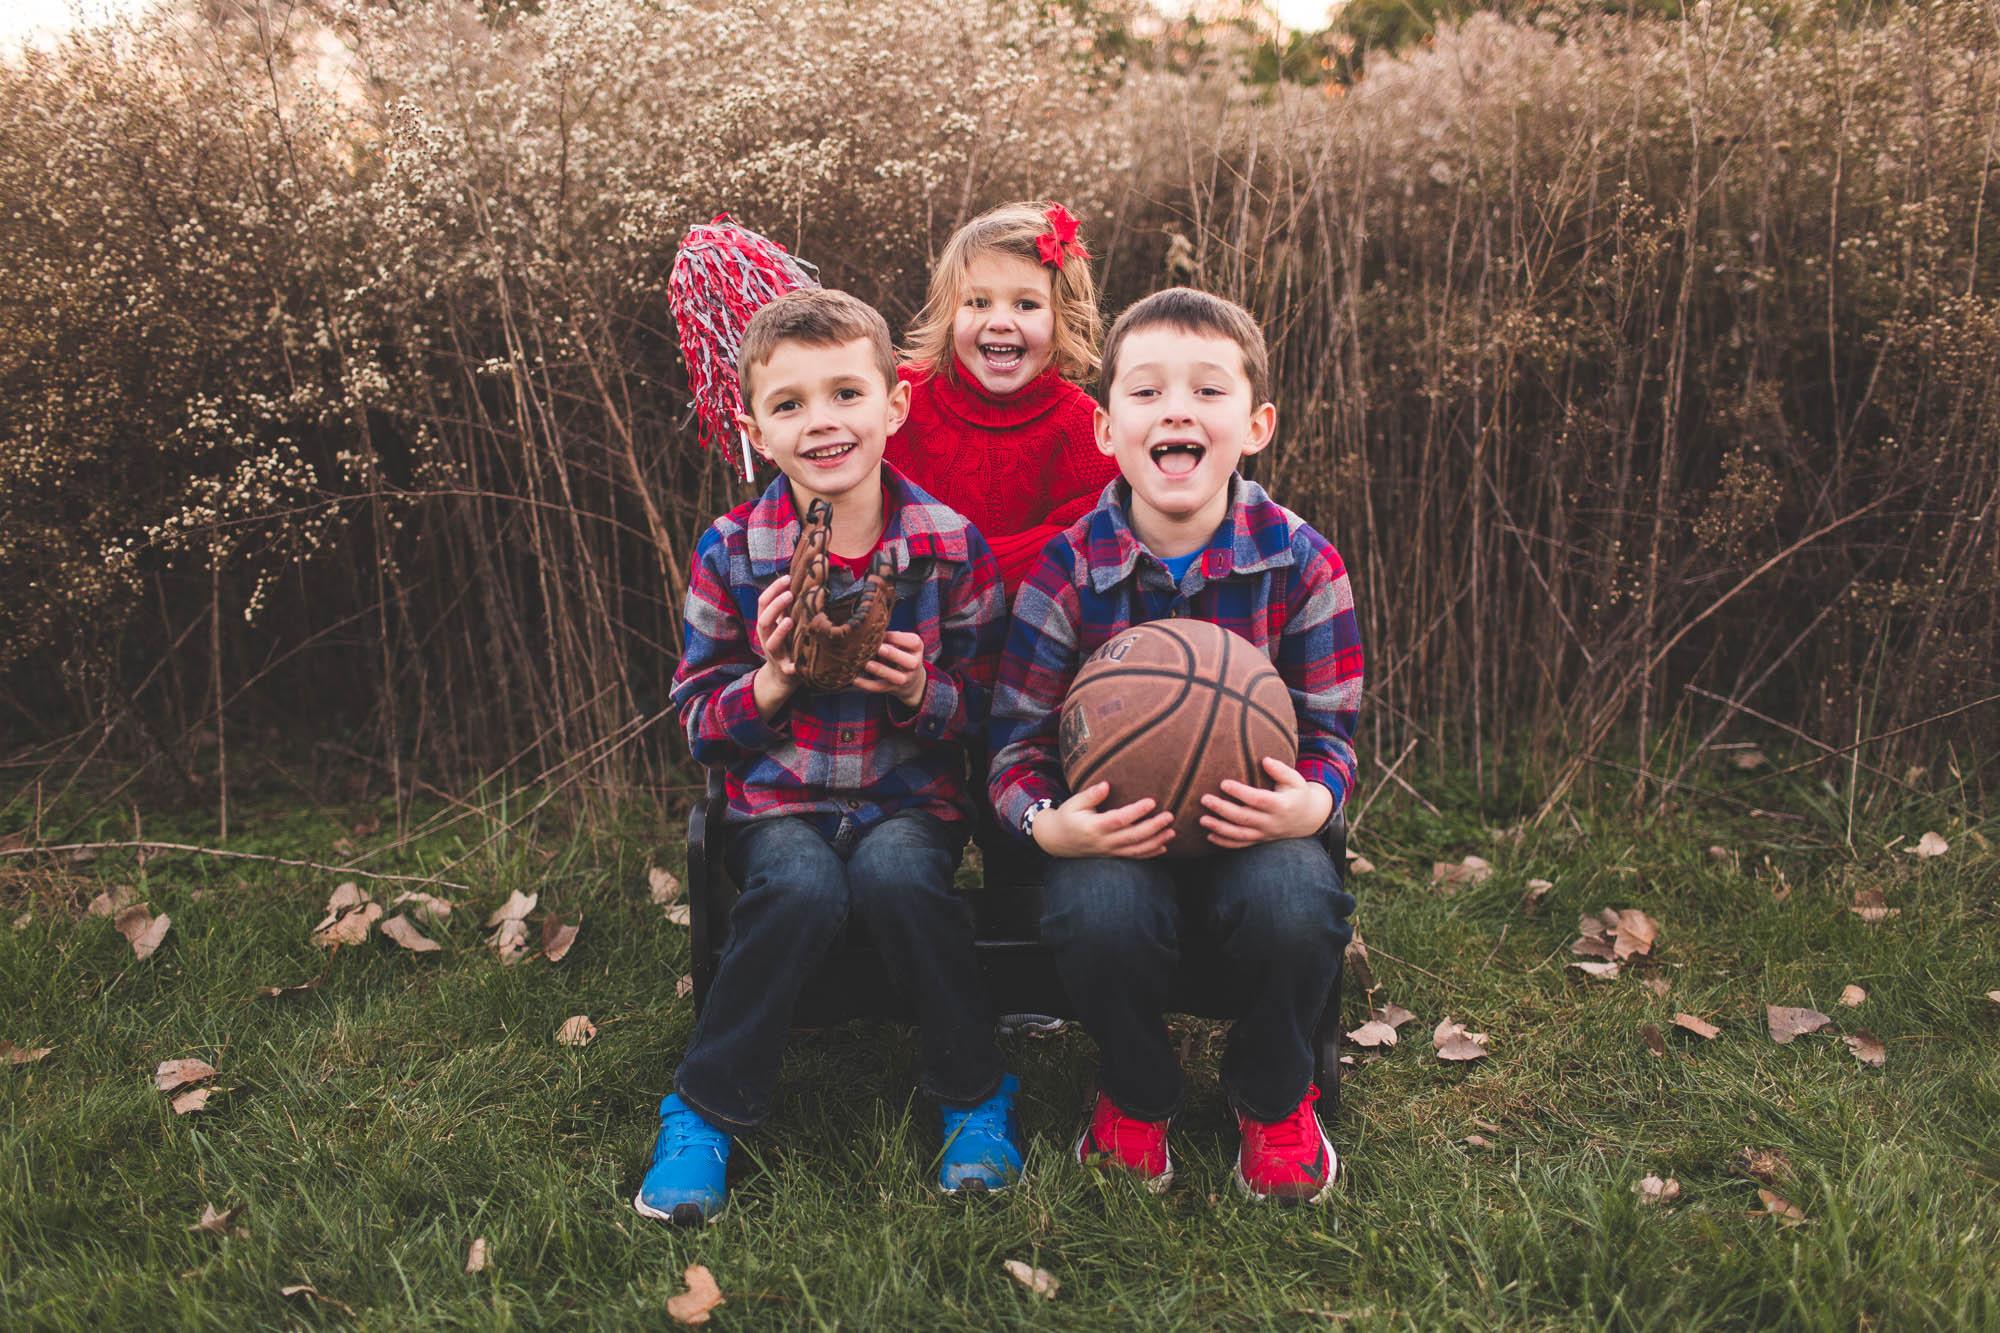 Children lifestyle hilliard ohio